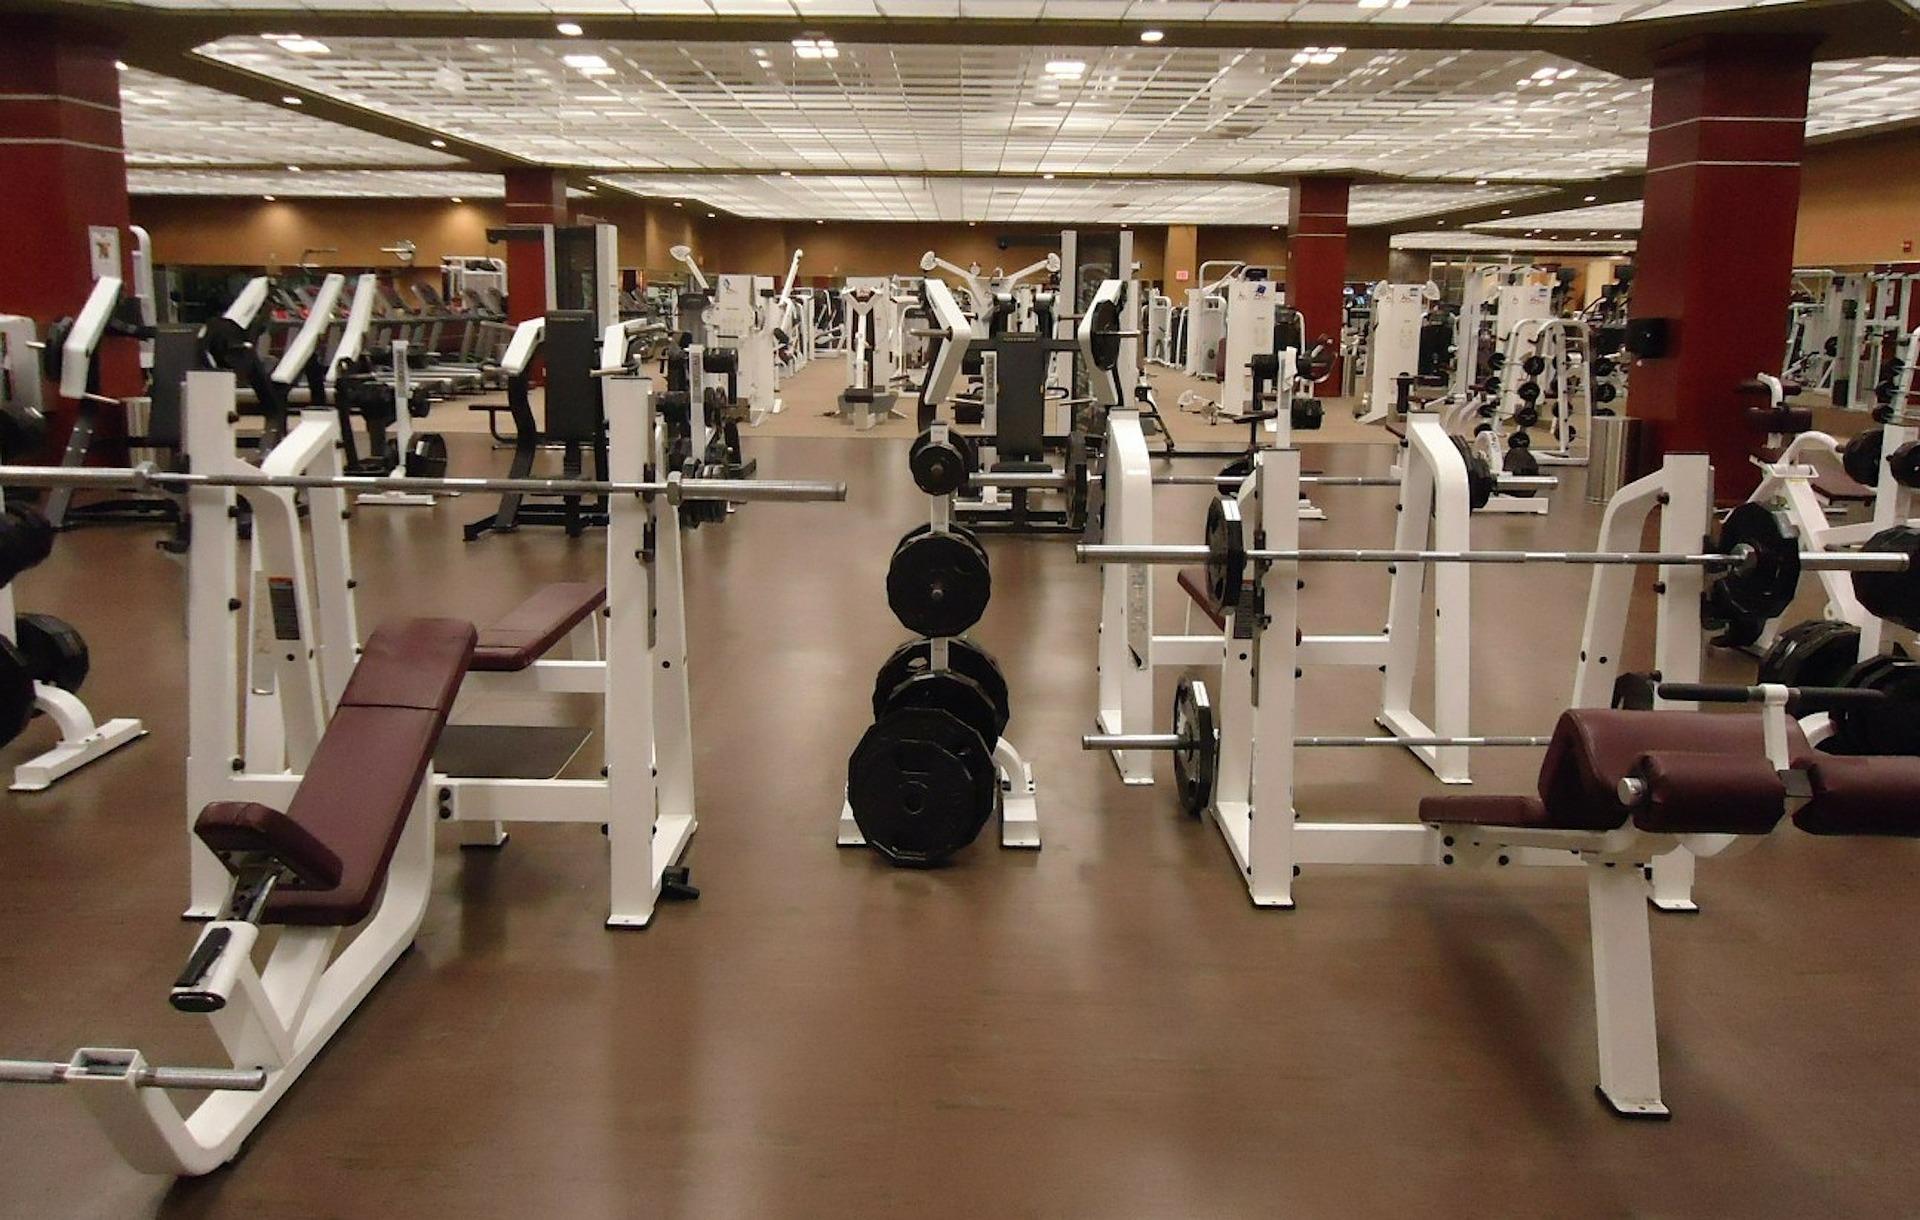 Fitnessstudio - Trainingsfläche